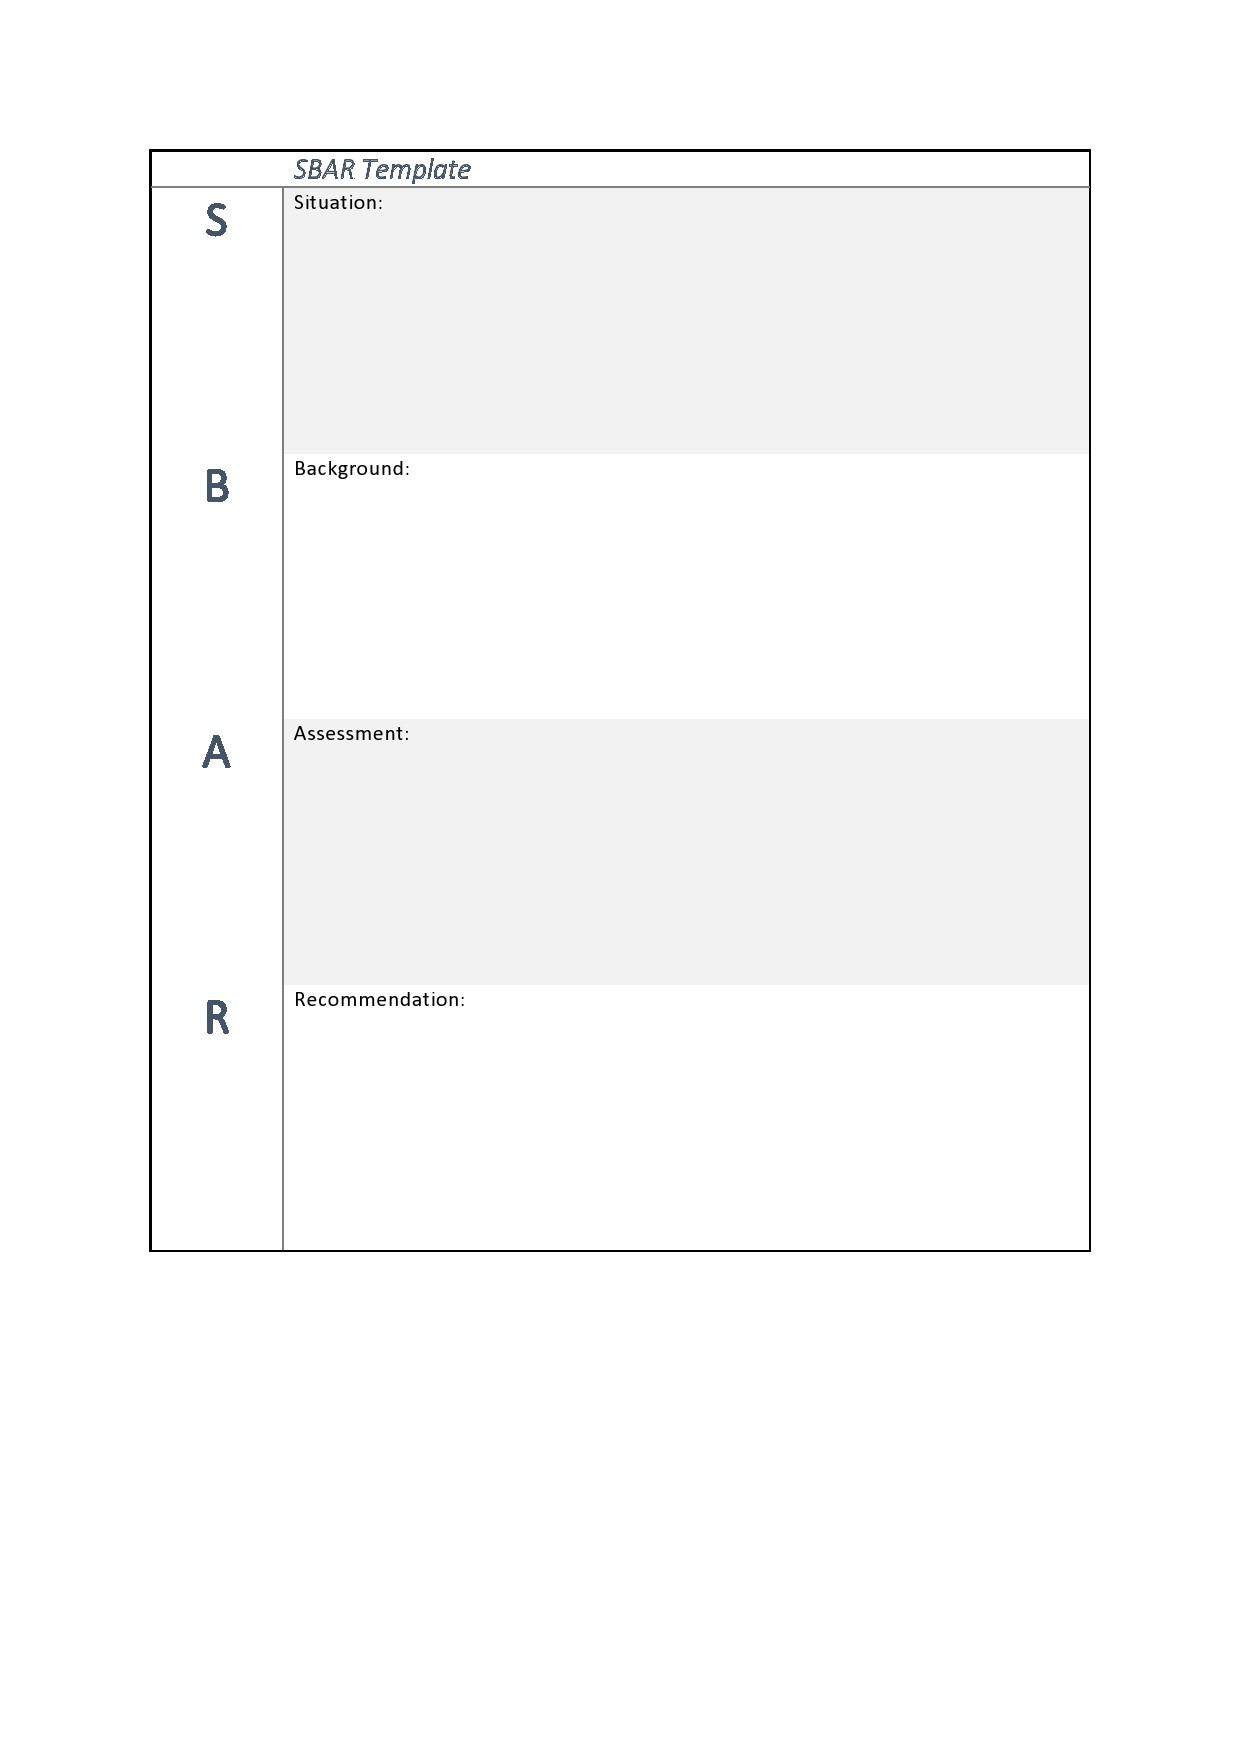 Free sbar template 01